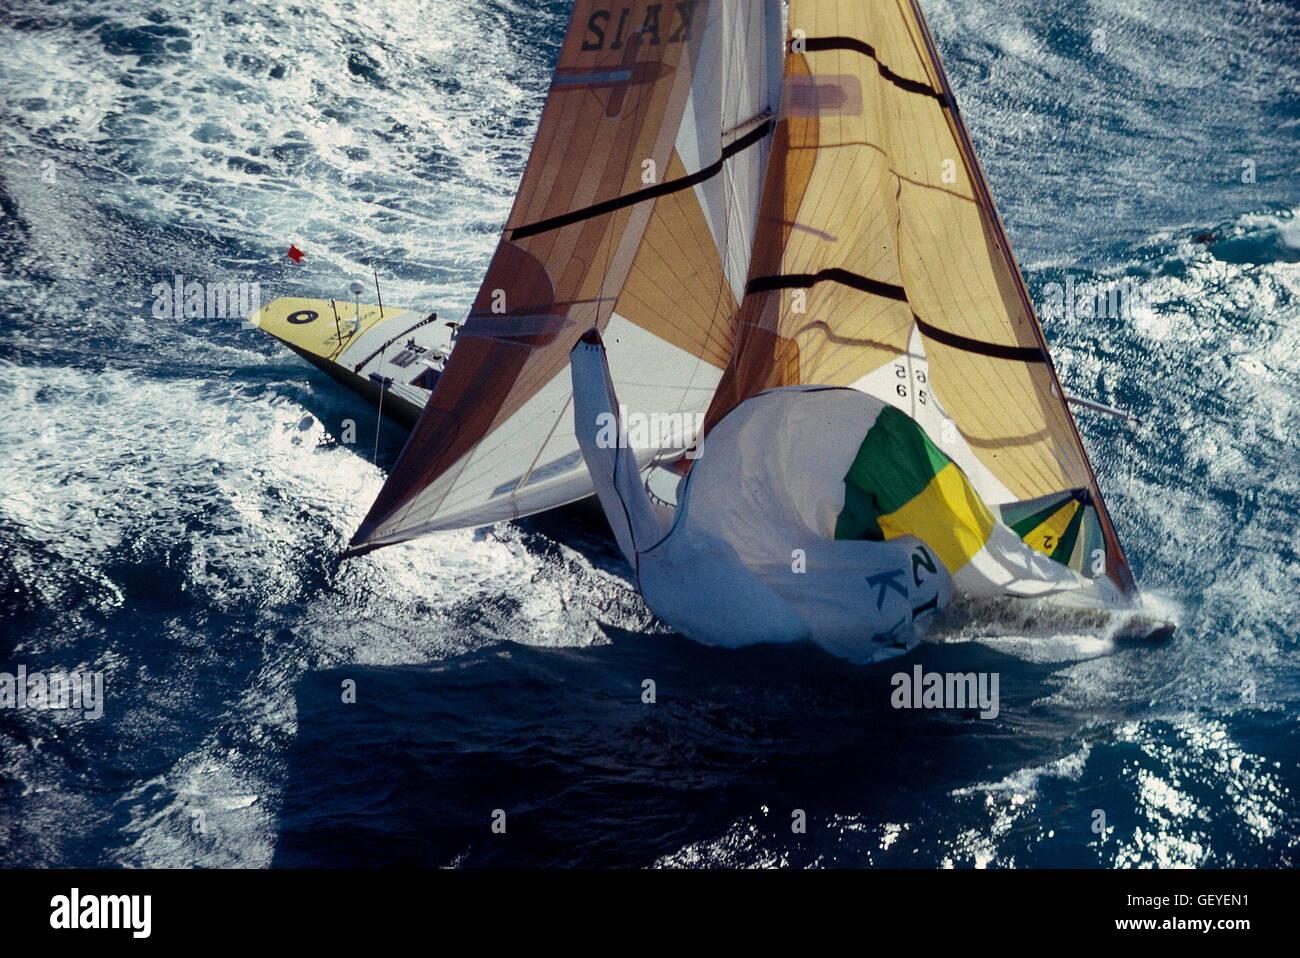 AJAXNETPHOTO. 1987. FREMANTLE, AUSTRALIA. - AMERICA'S CUP. - KOOKABURRA III DROPS HER SPINNAKER.  PHOTO:JONATHAN - Stock Image